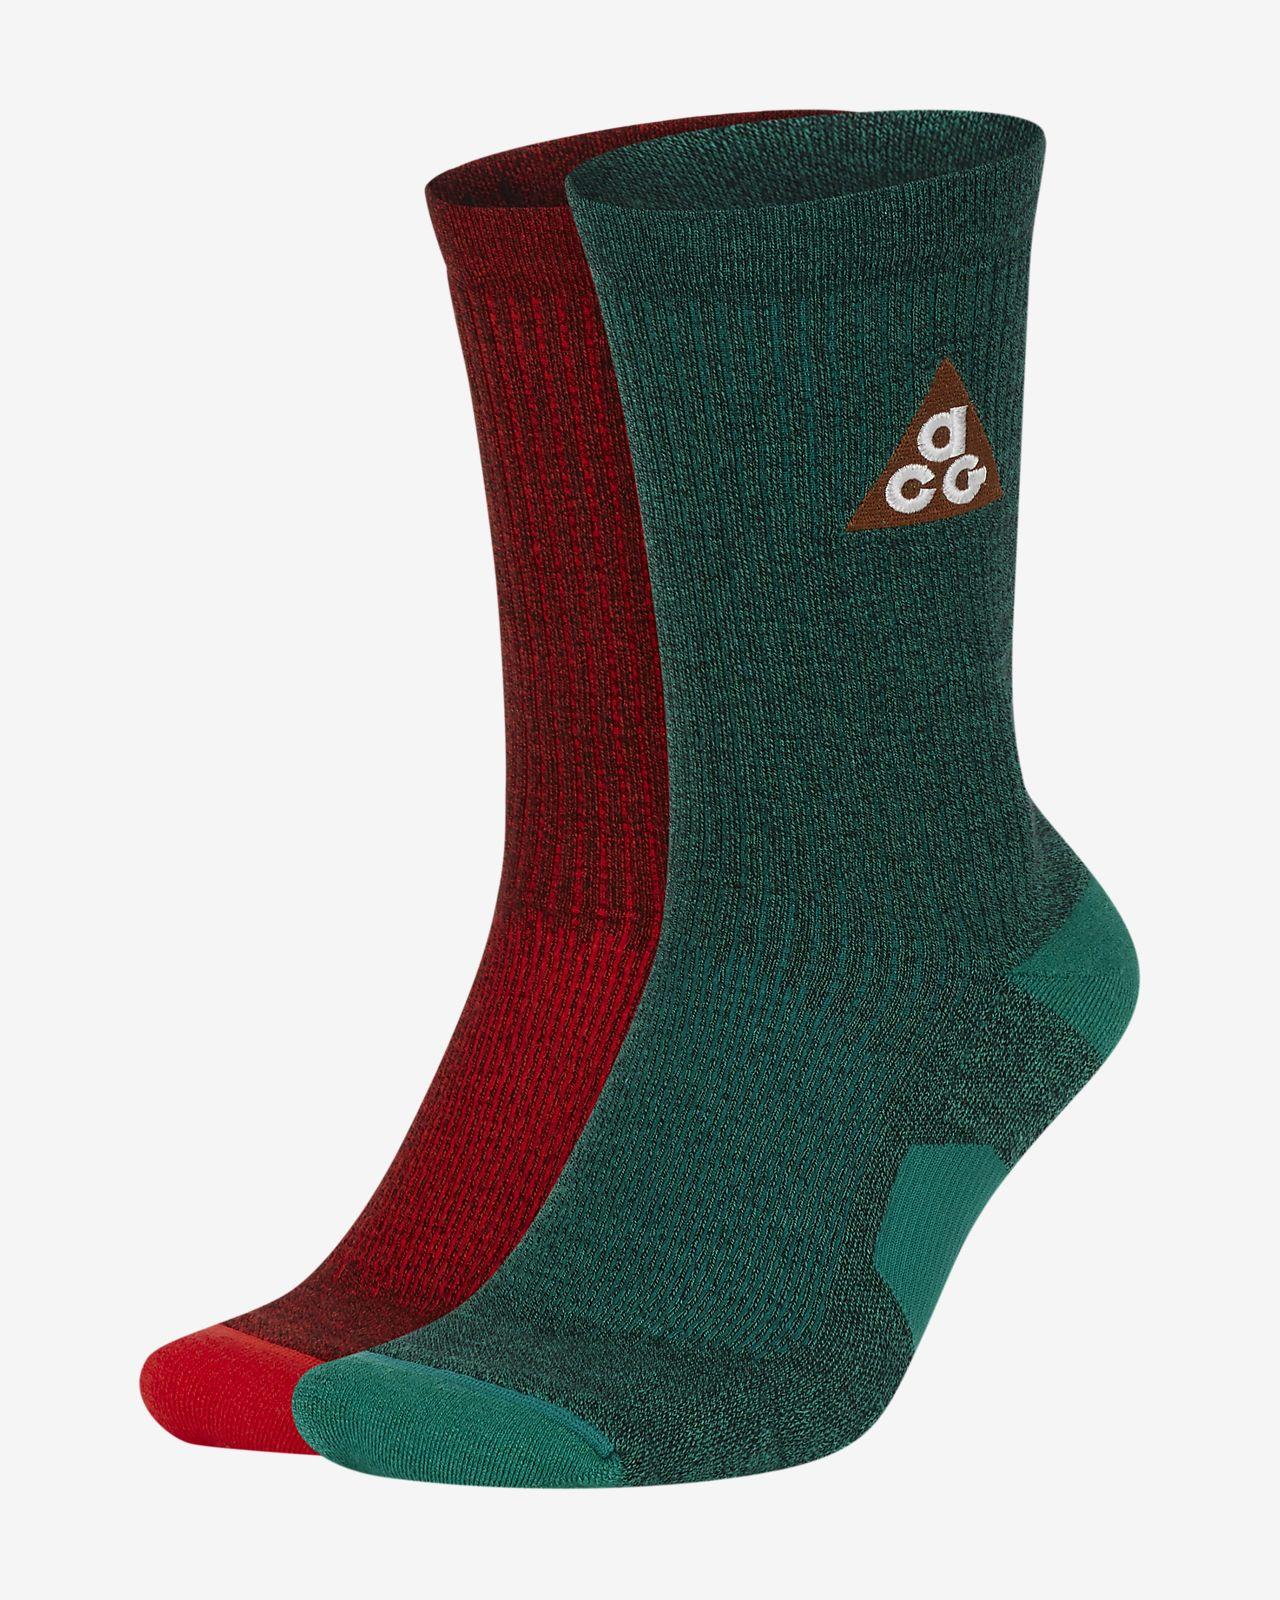 Nike ACG 365 中筒襪 (2 雙)